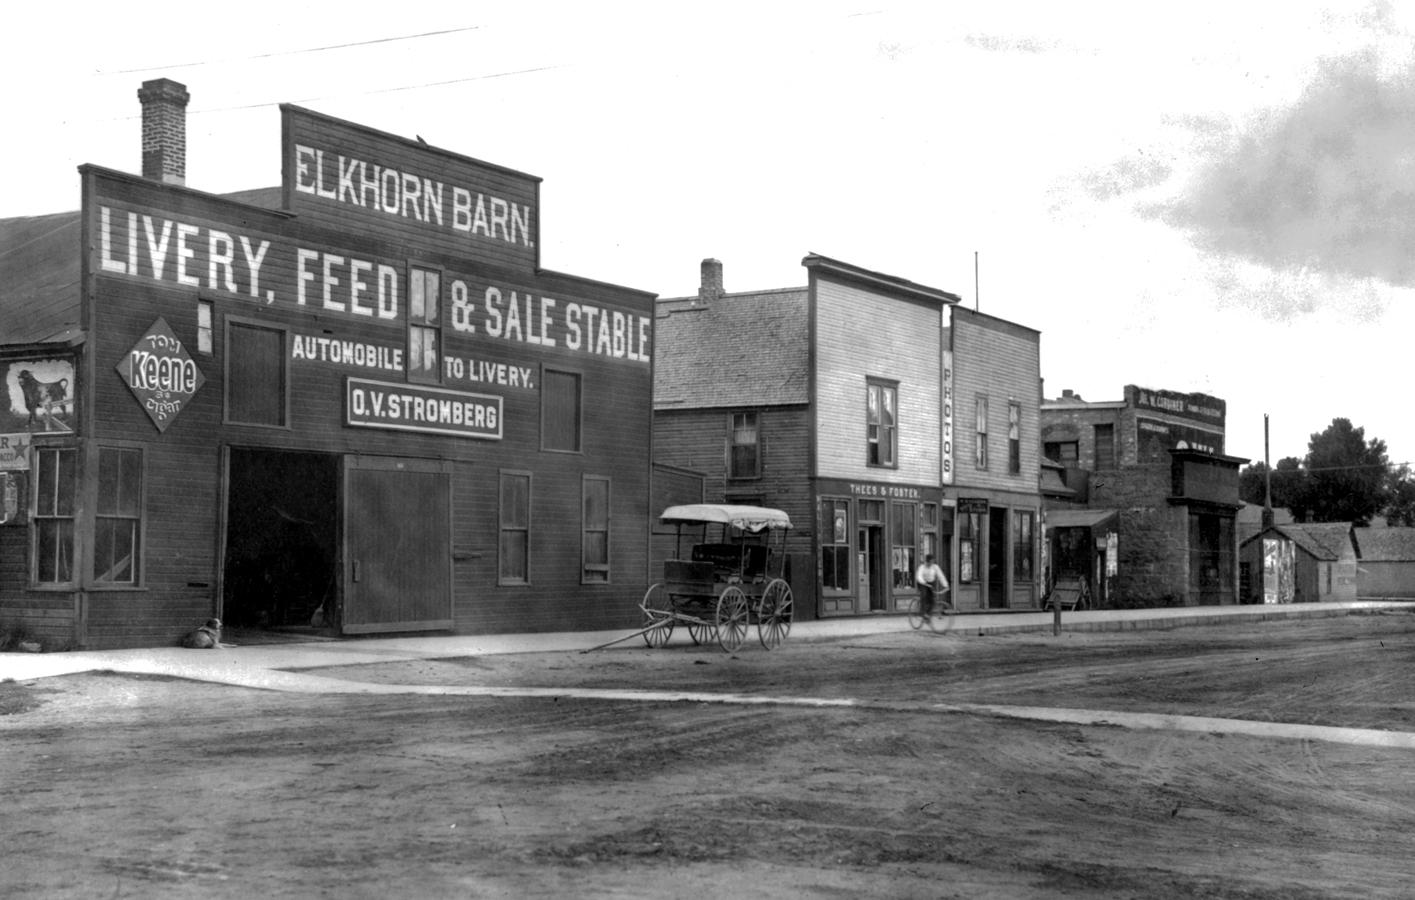 869-Sub-Neg-15308,-Elkhorn-Livery-Stable,-3rd-Street,-Laramie-dura